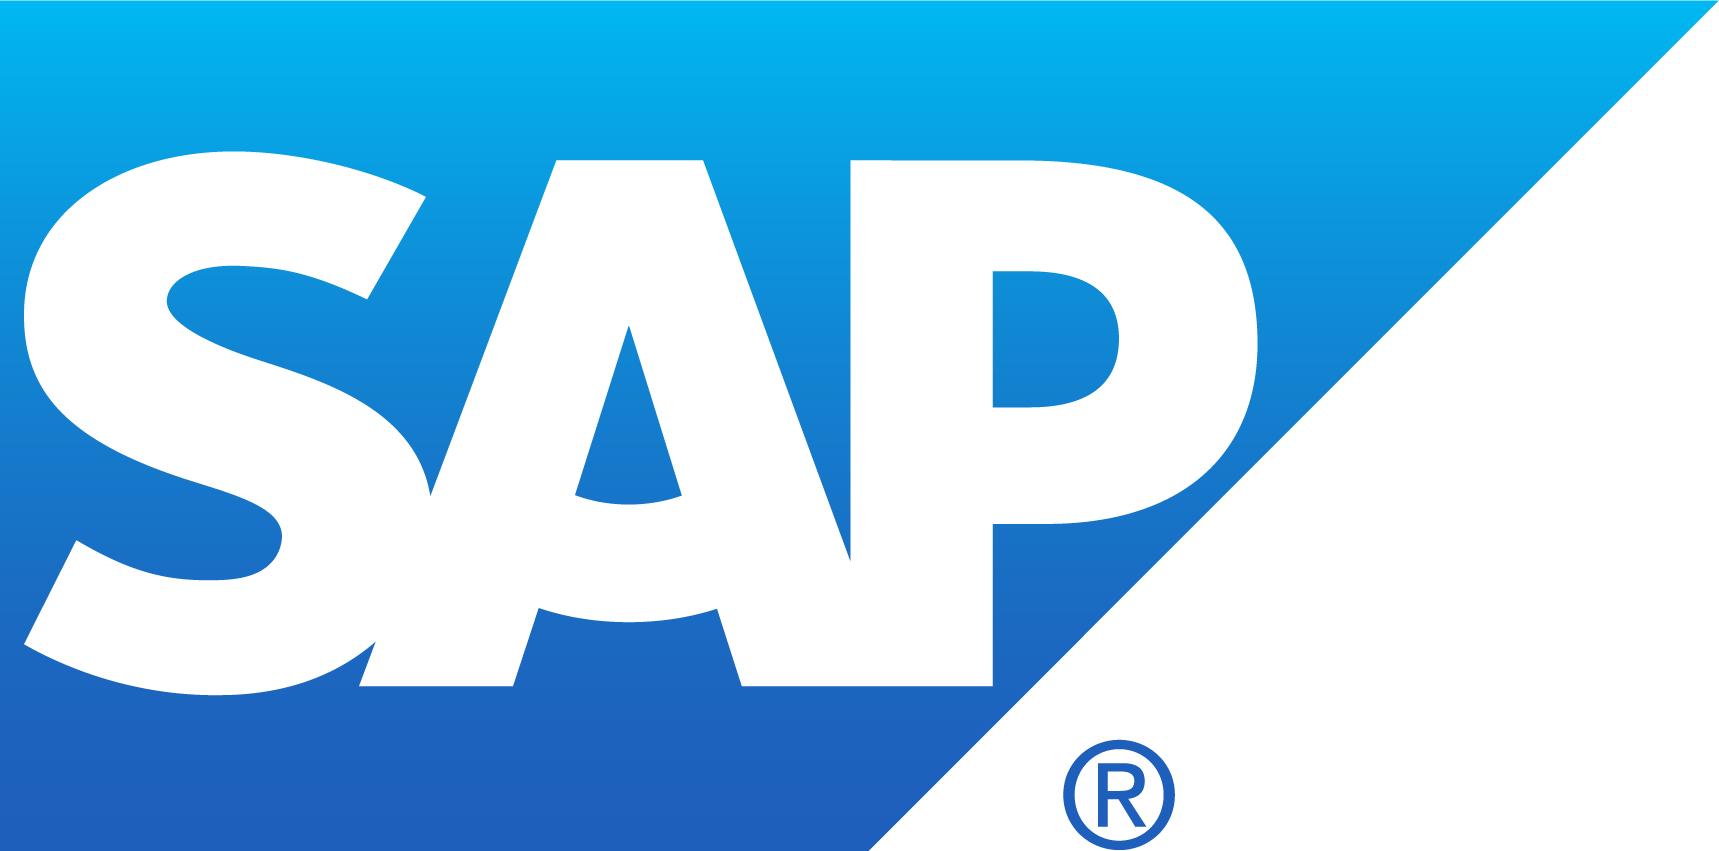 SAP_R_grad